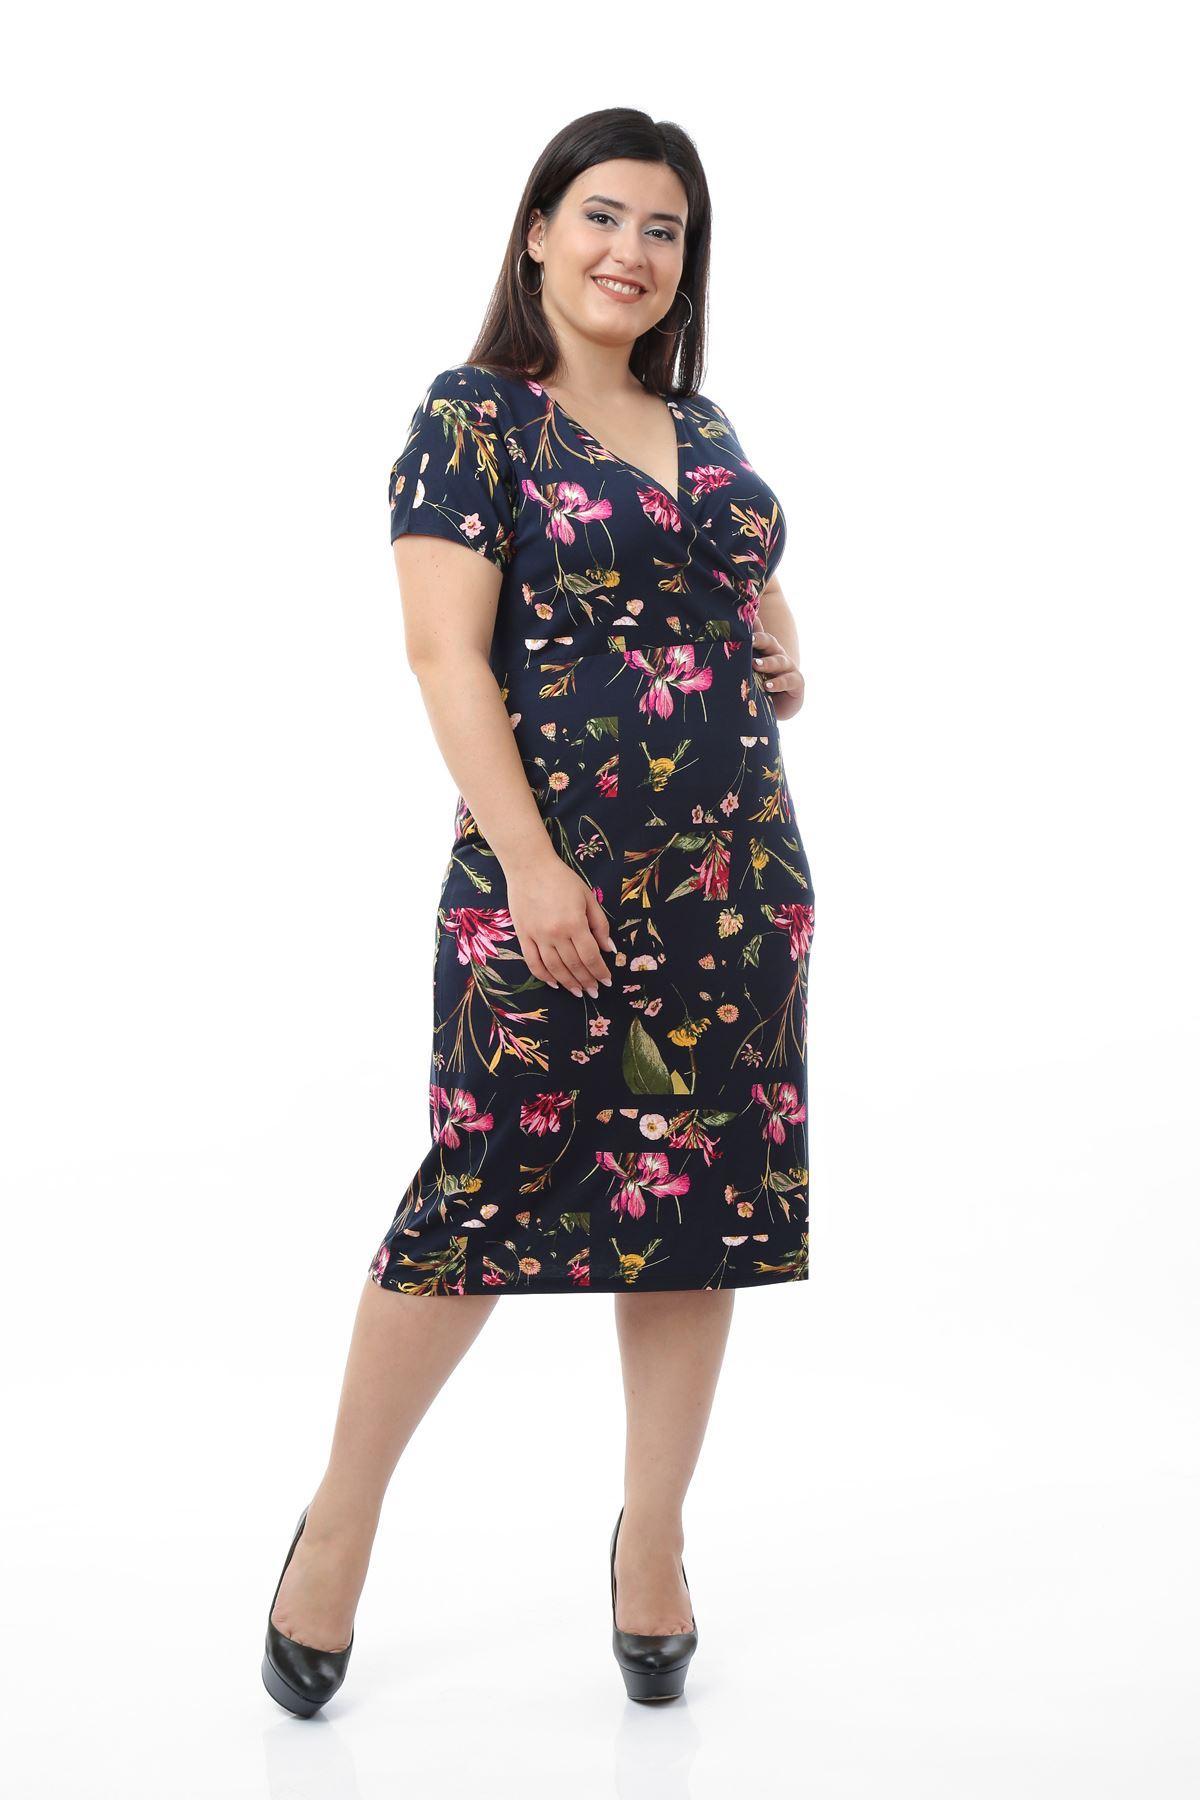 Kesit Desen Elbise 3D-0661